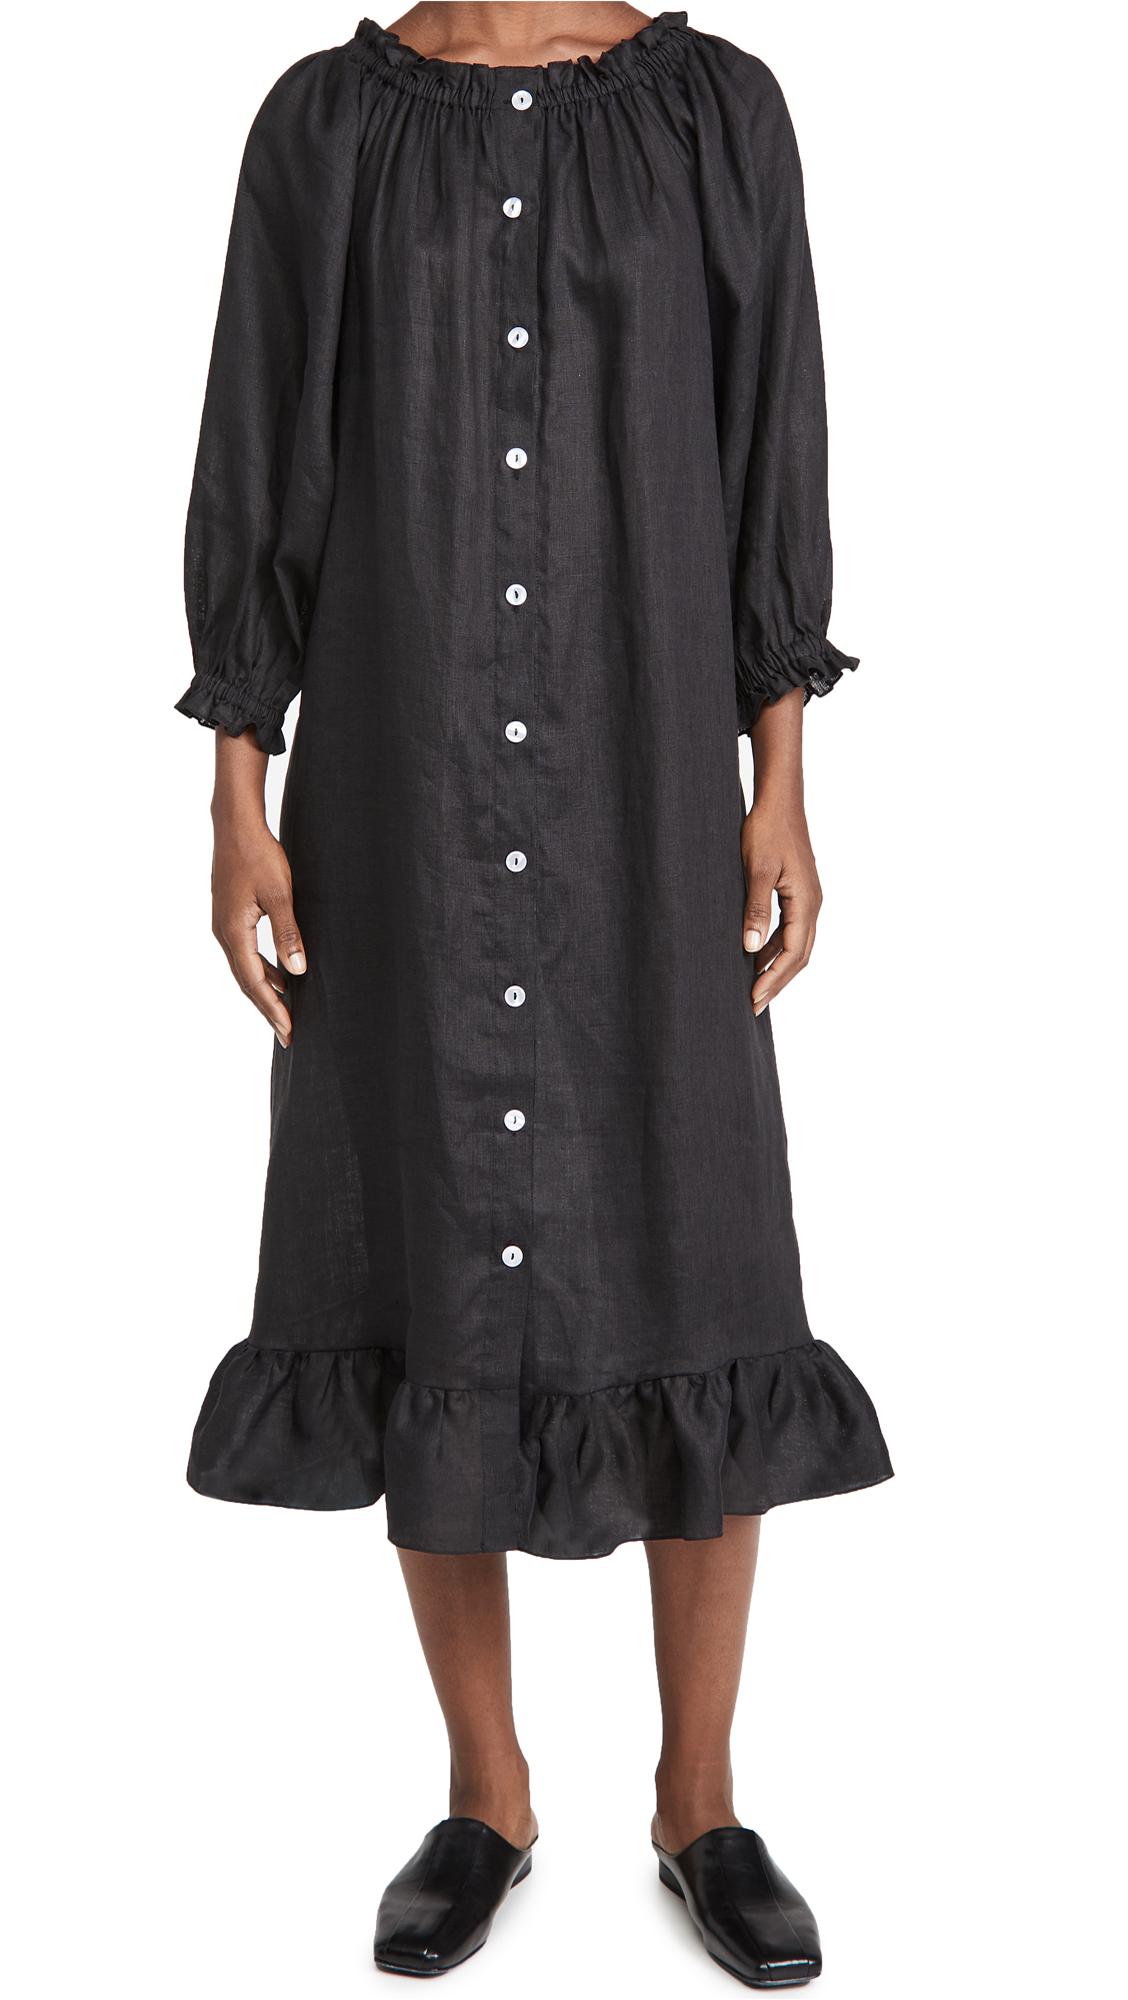 Sleeper Coal Black Loungewear Dress